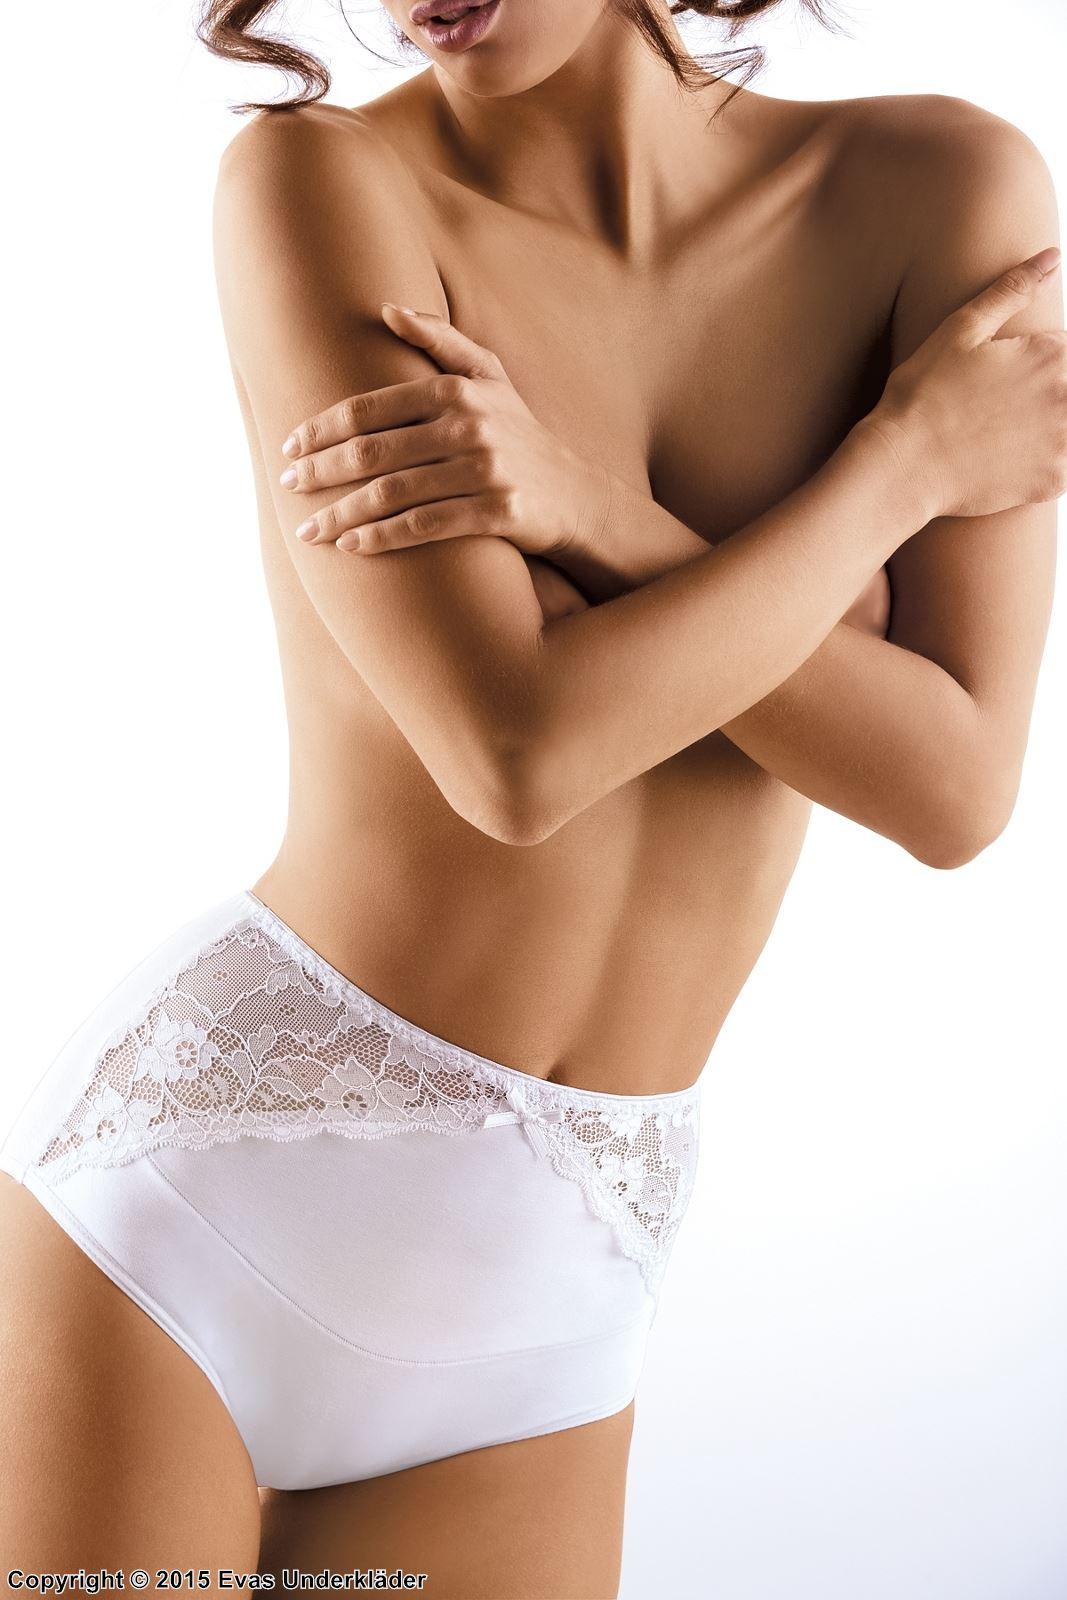 stora klitorisar prostata dildo